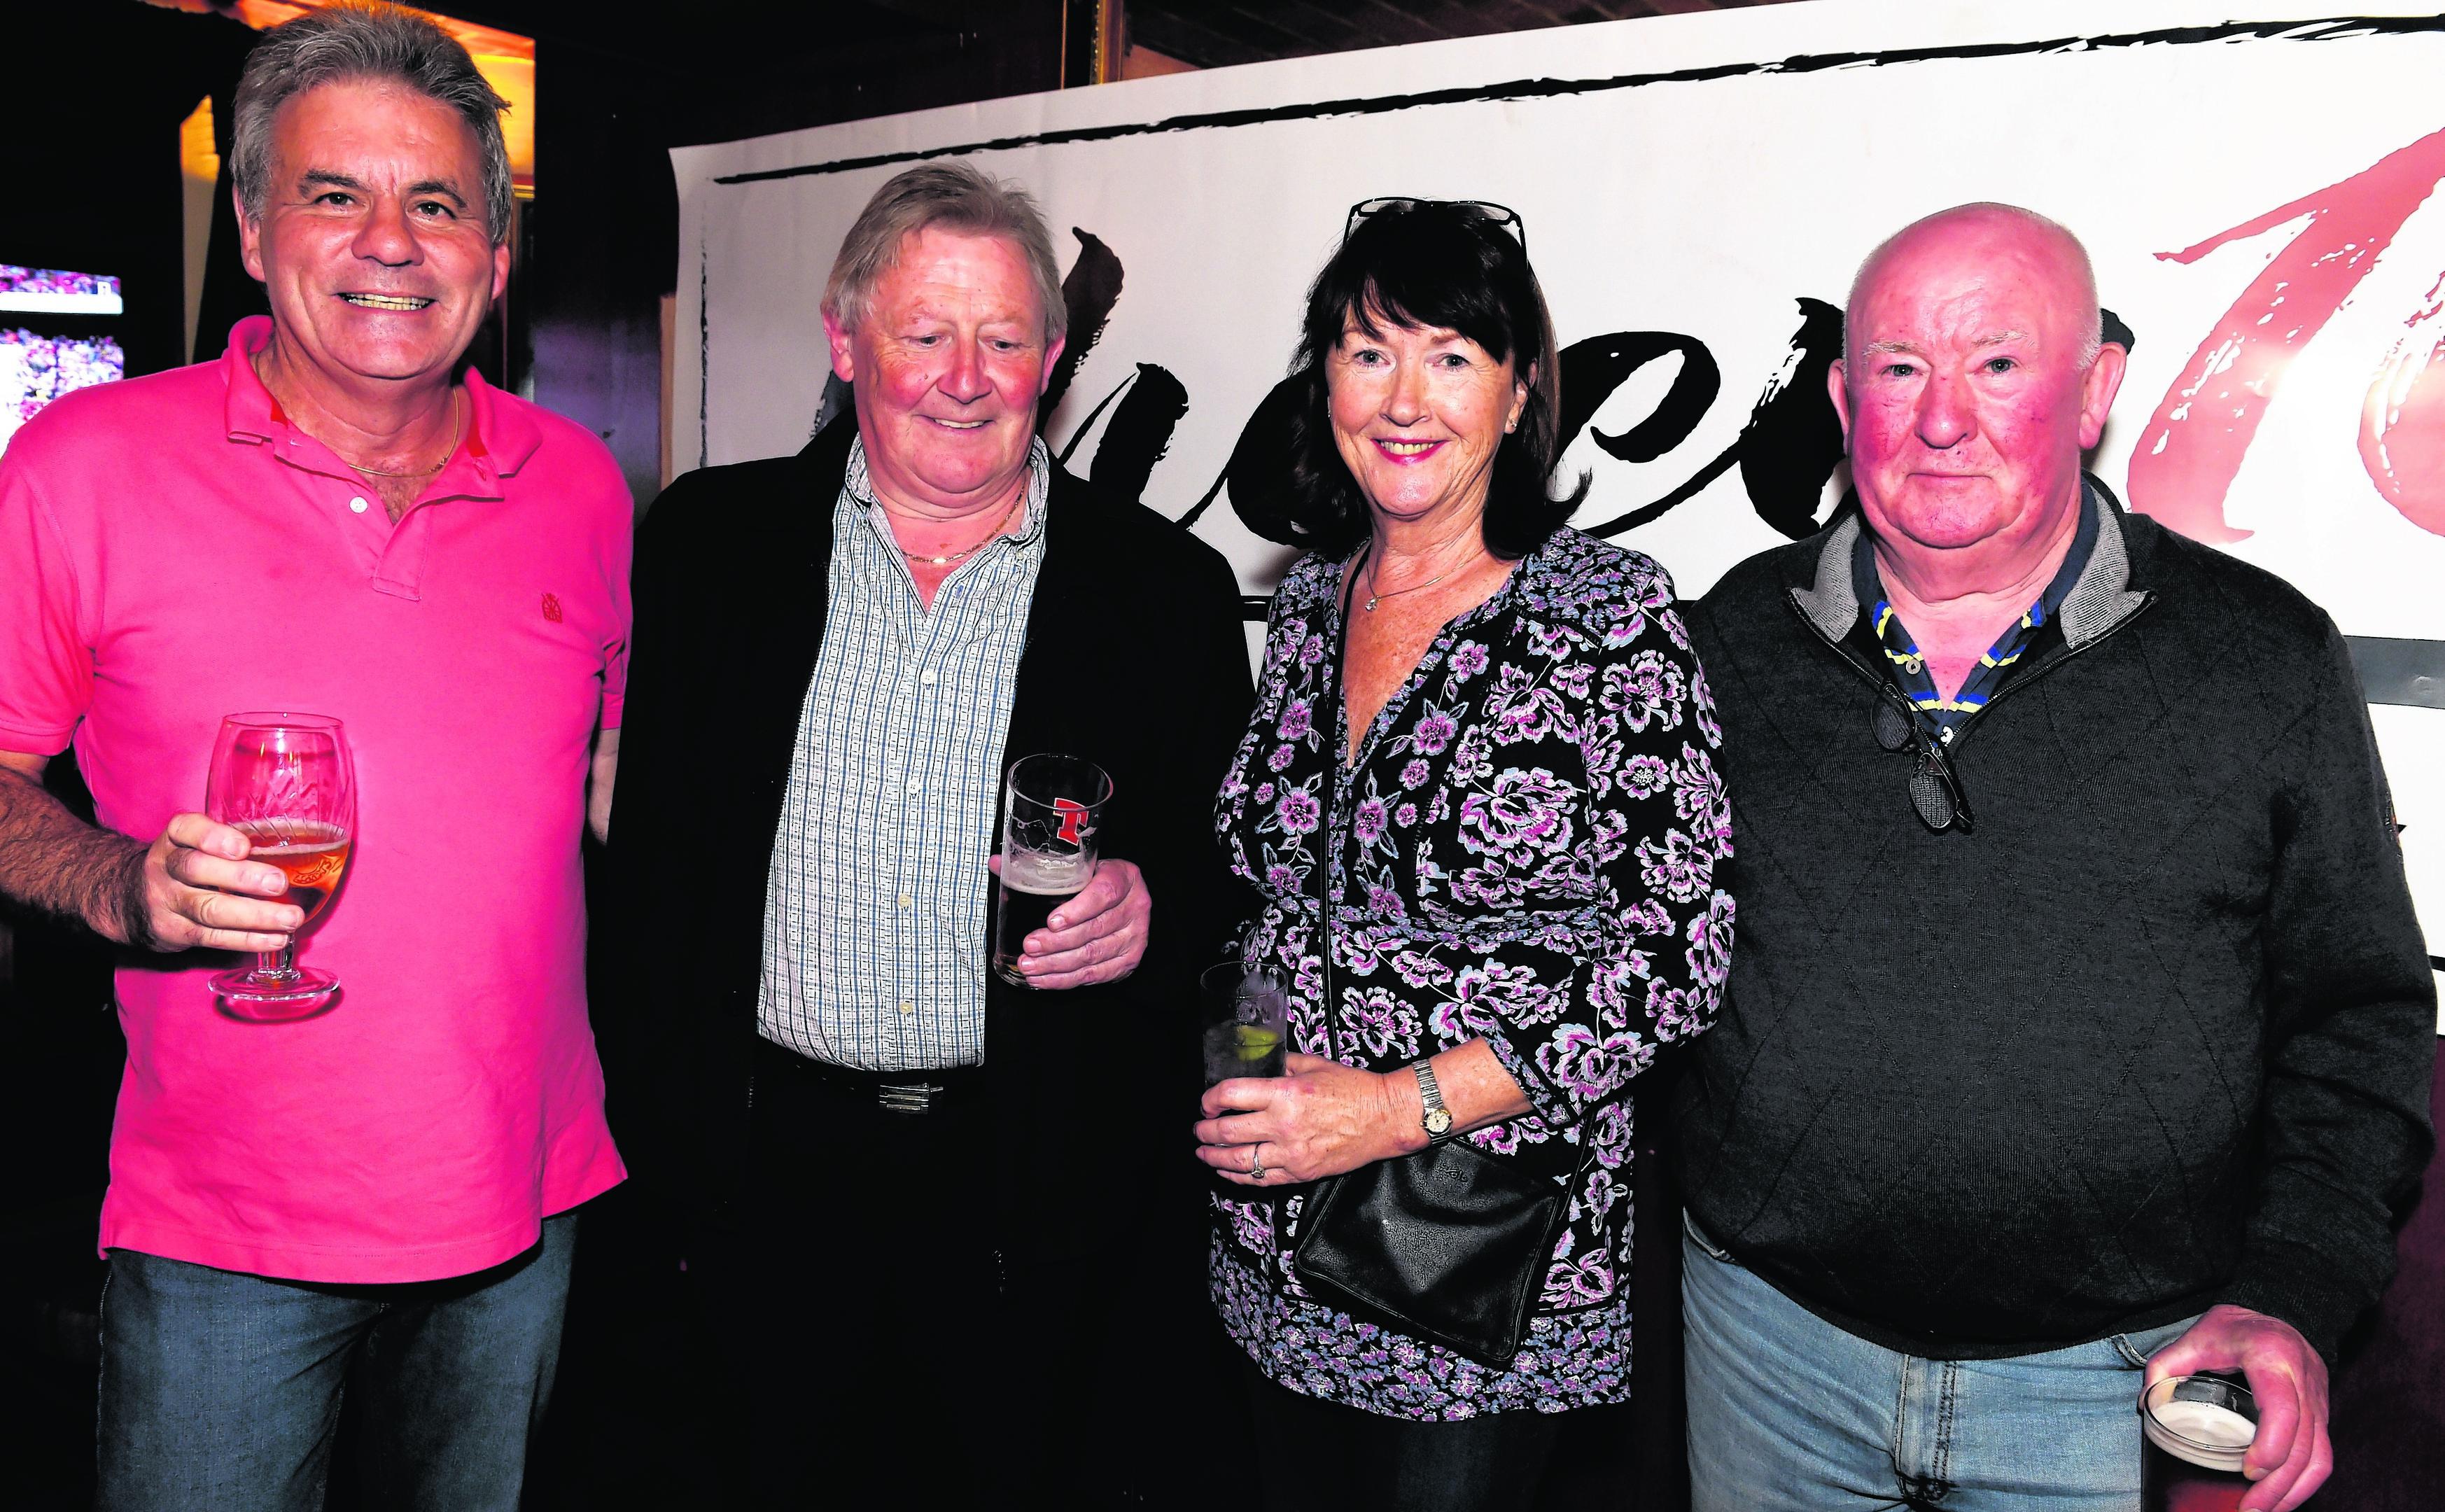 Gordon Wilson, Mike Graham, Rhona Jarvis and David Davidson.